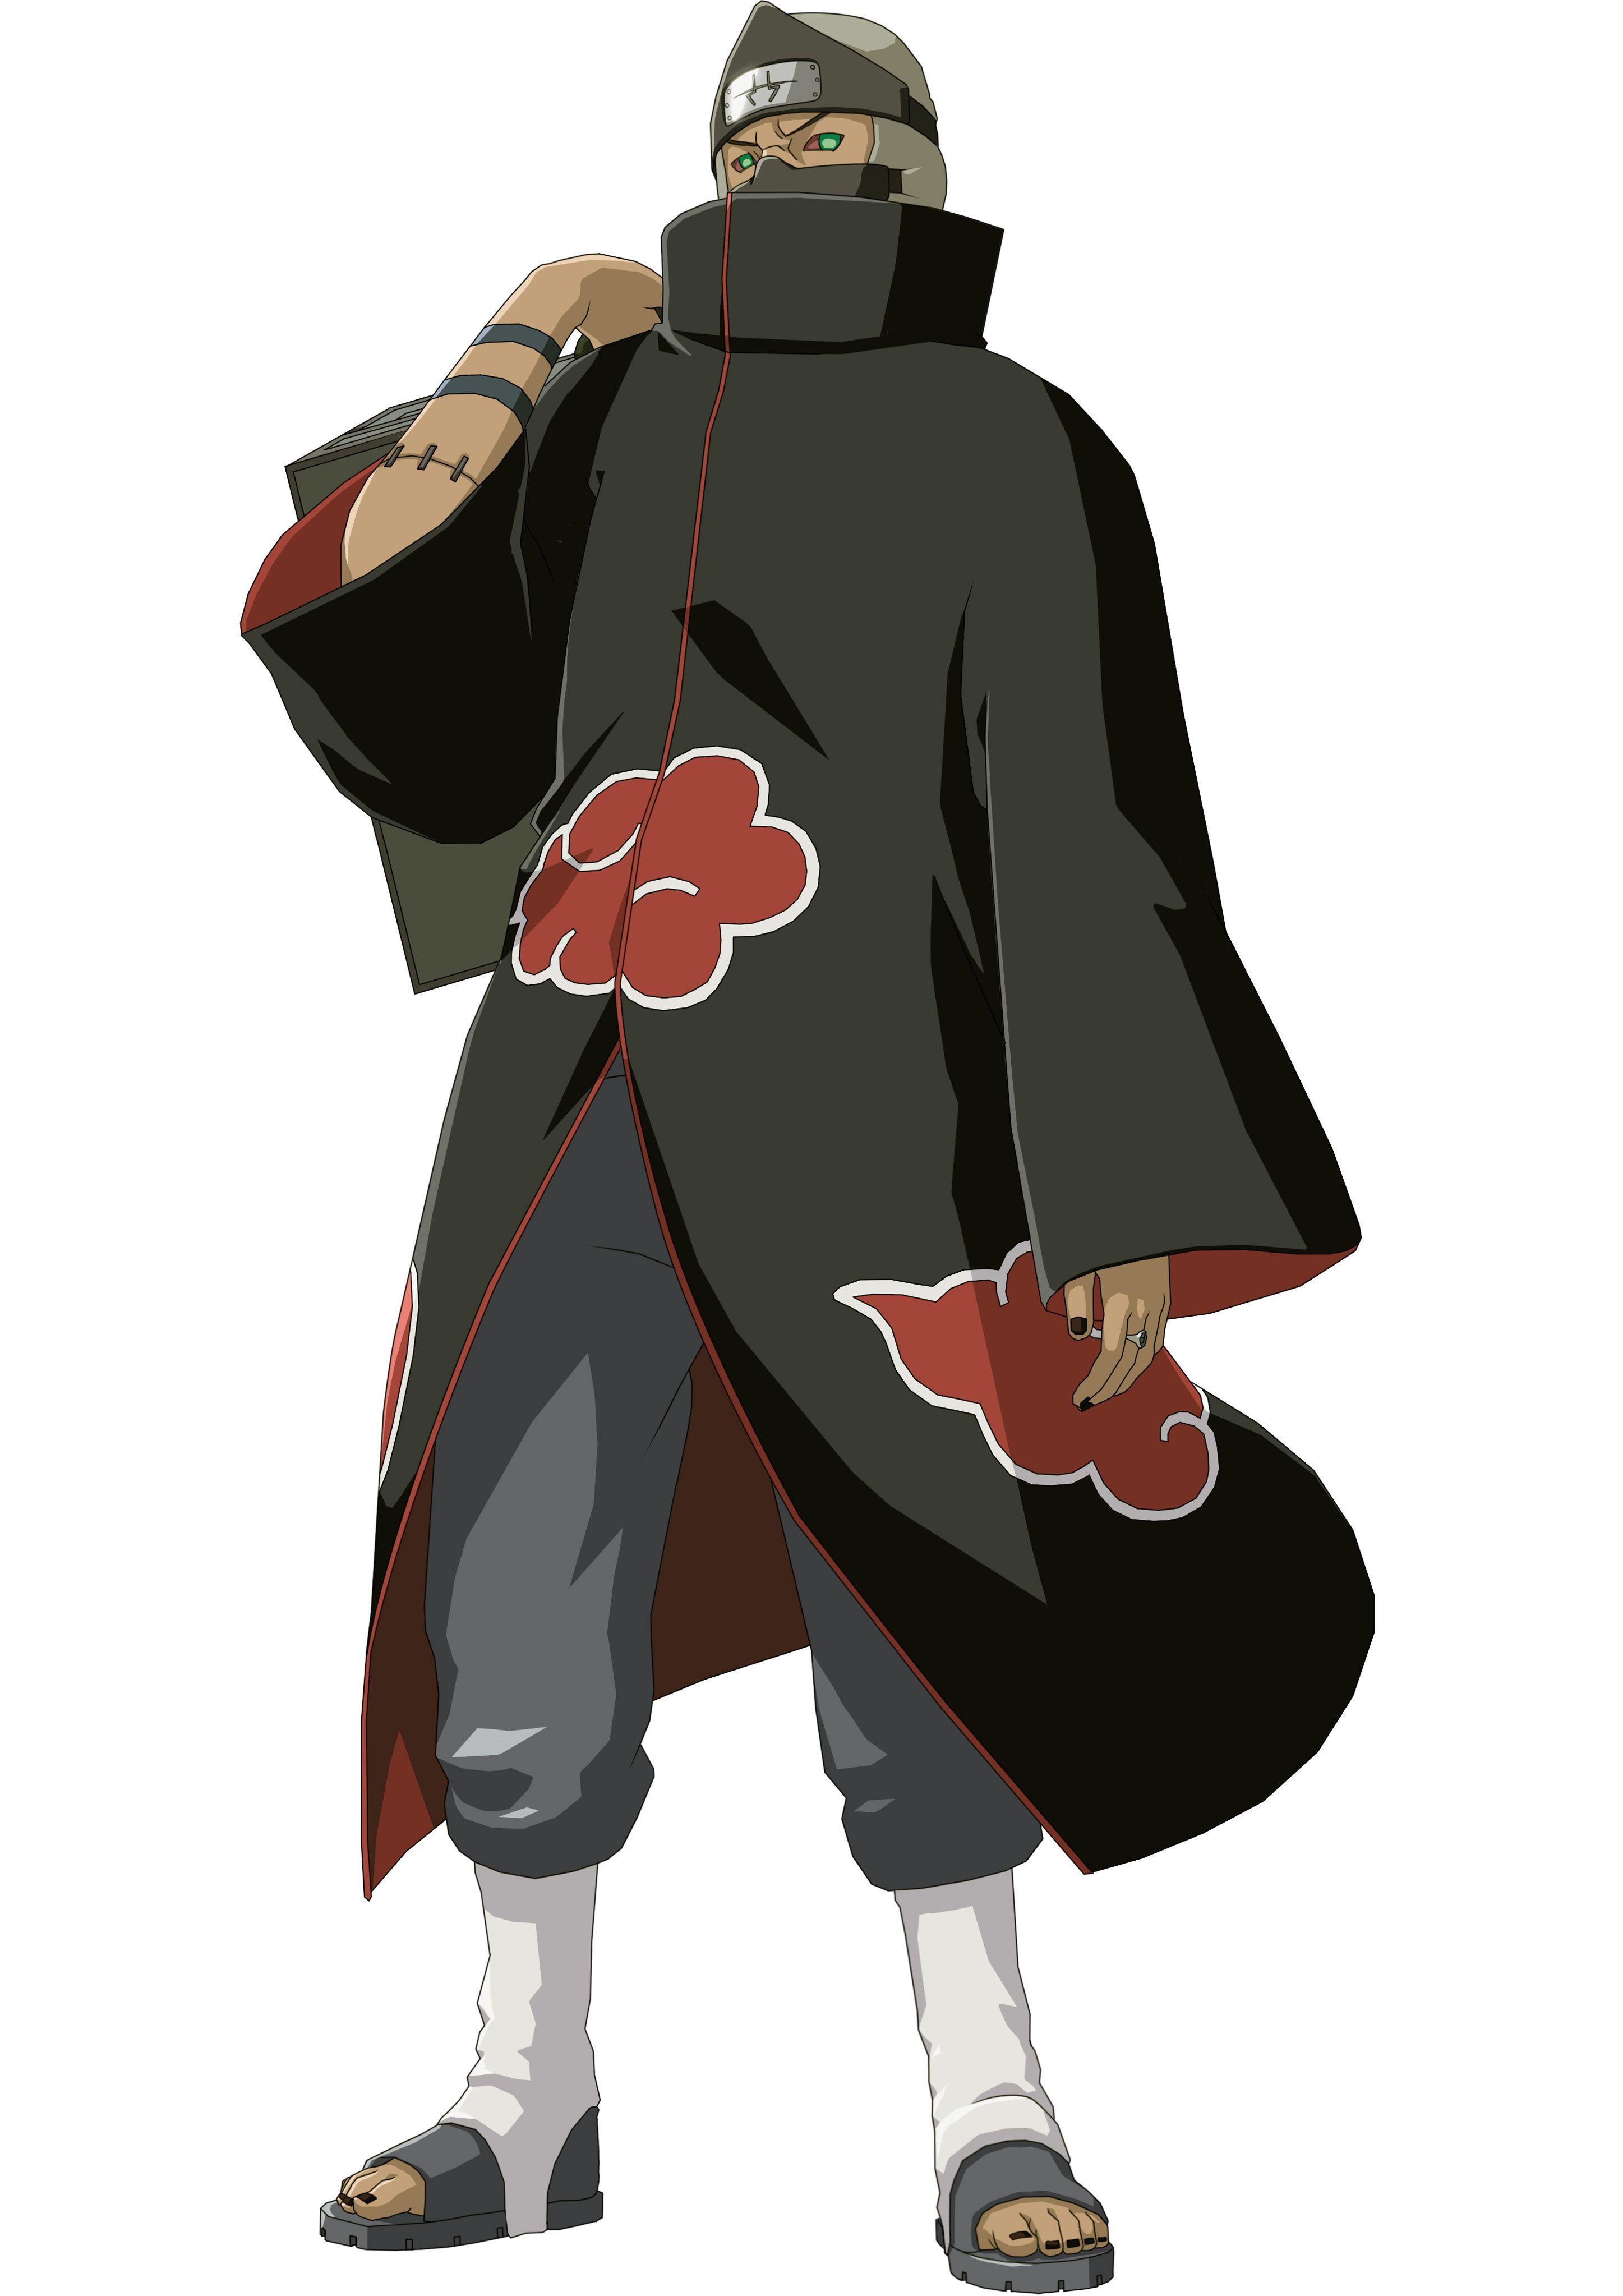 Favoritos Pin by Cam on Naruto | Pinterest | Naruto and Anime EK38